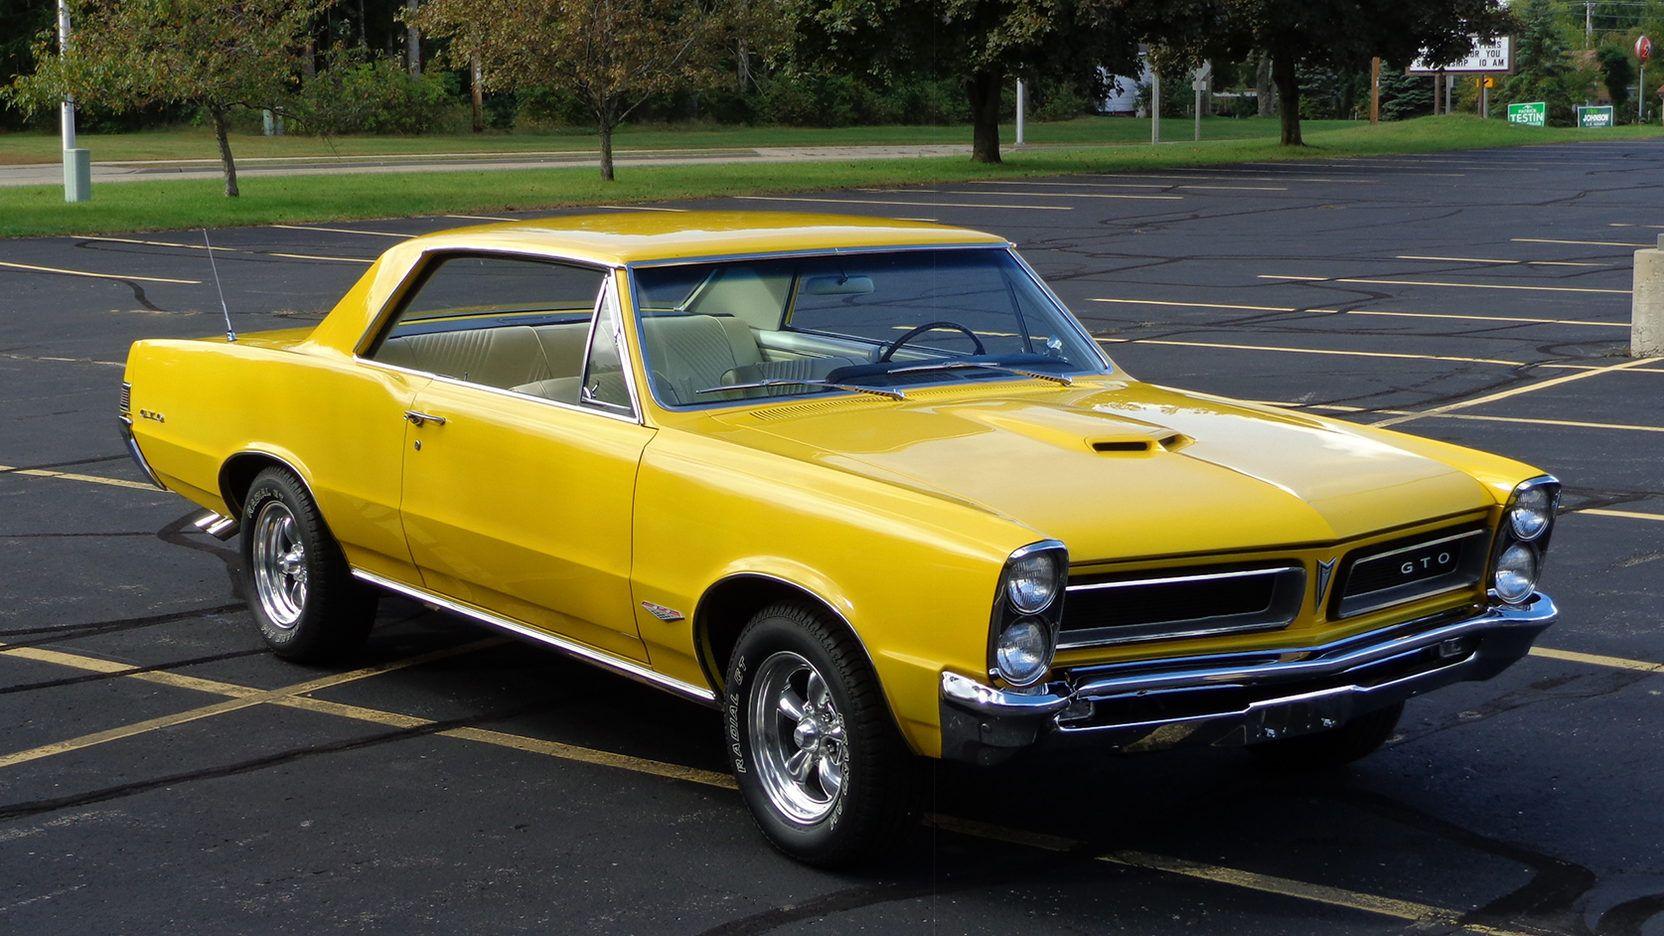 1965 Pontiac Gto 455 Tri Power 4 Speed 3 55 Positraction Rear 1965 Pontiac Gto Pontiac Gto Gto